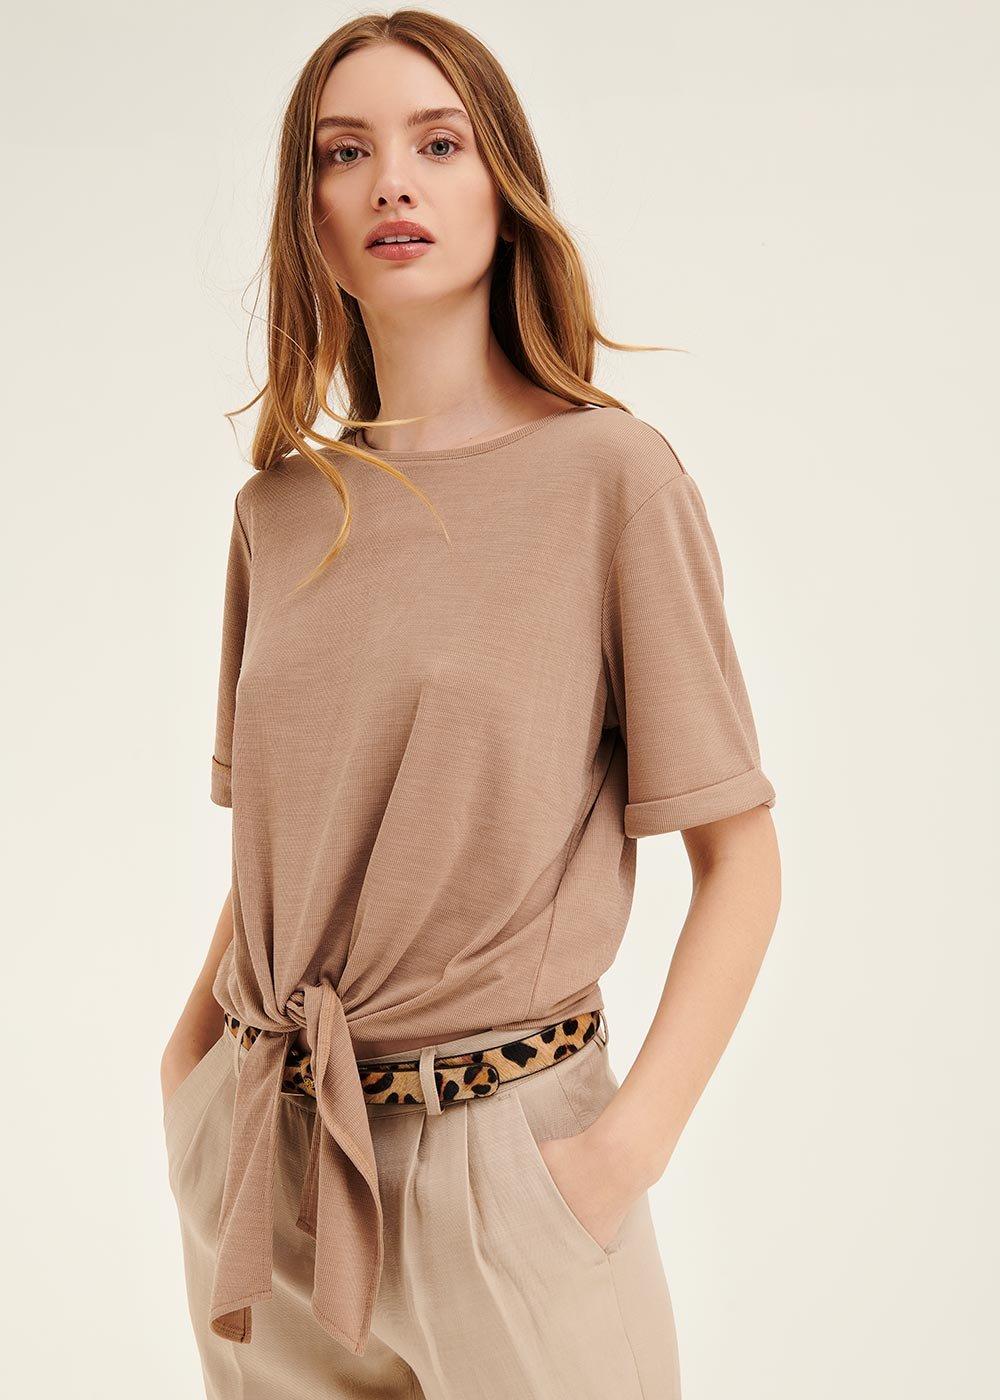 T-shirt Stephanie con fiocco al fondo - Taupe - Donna